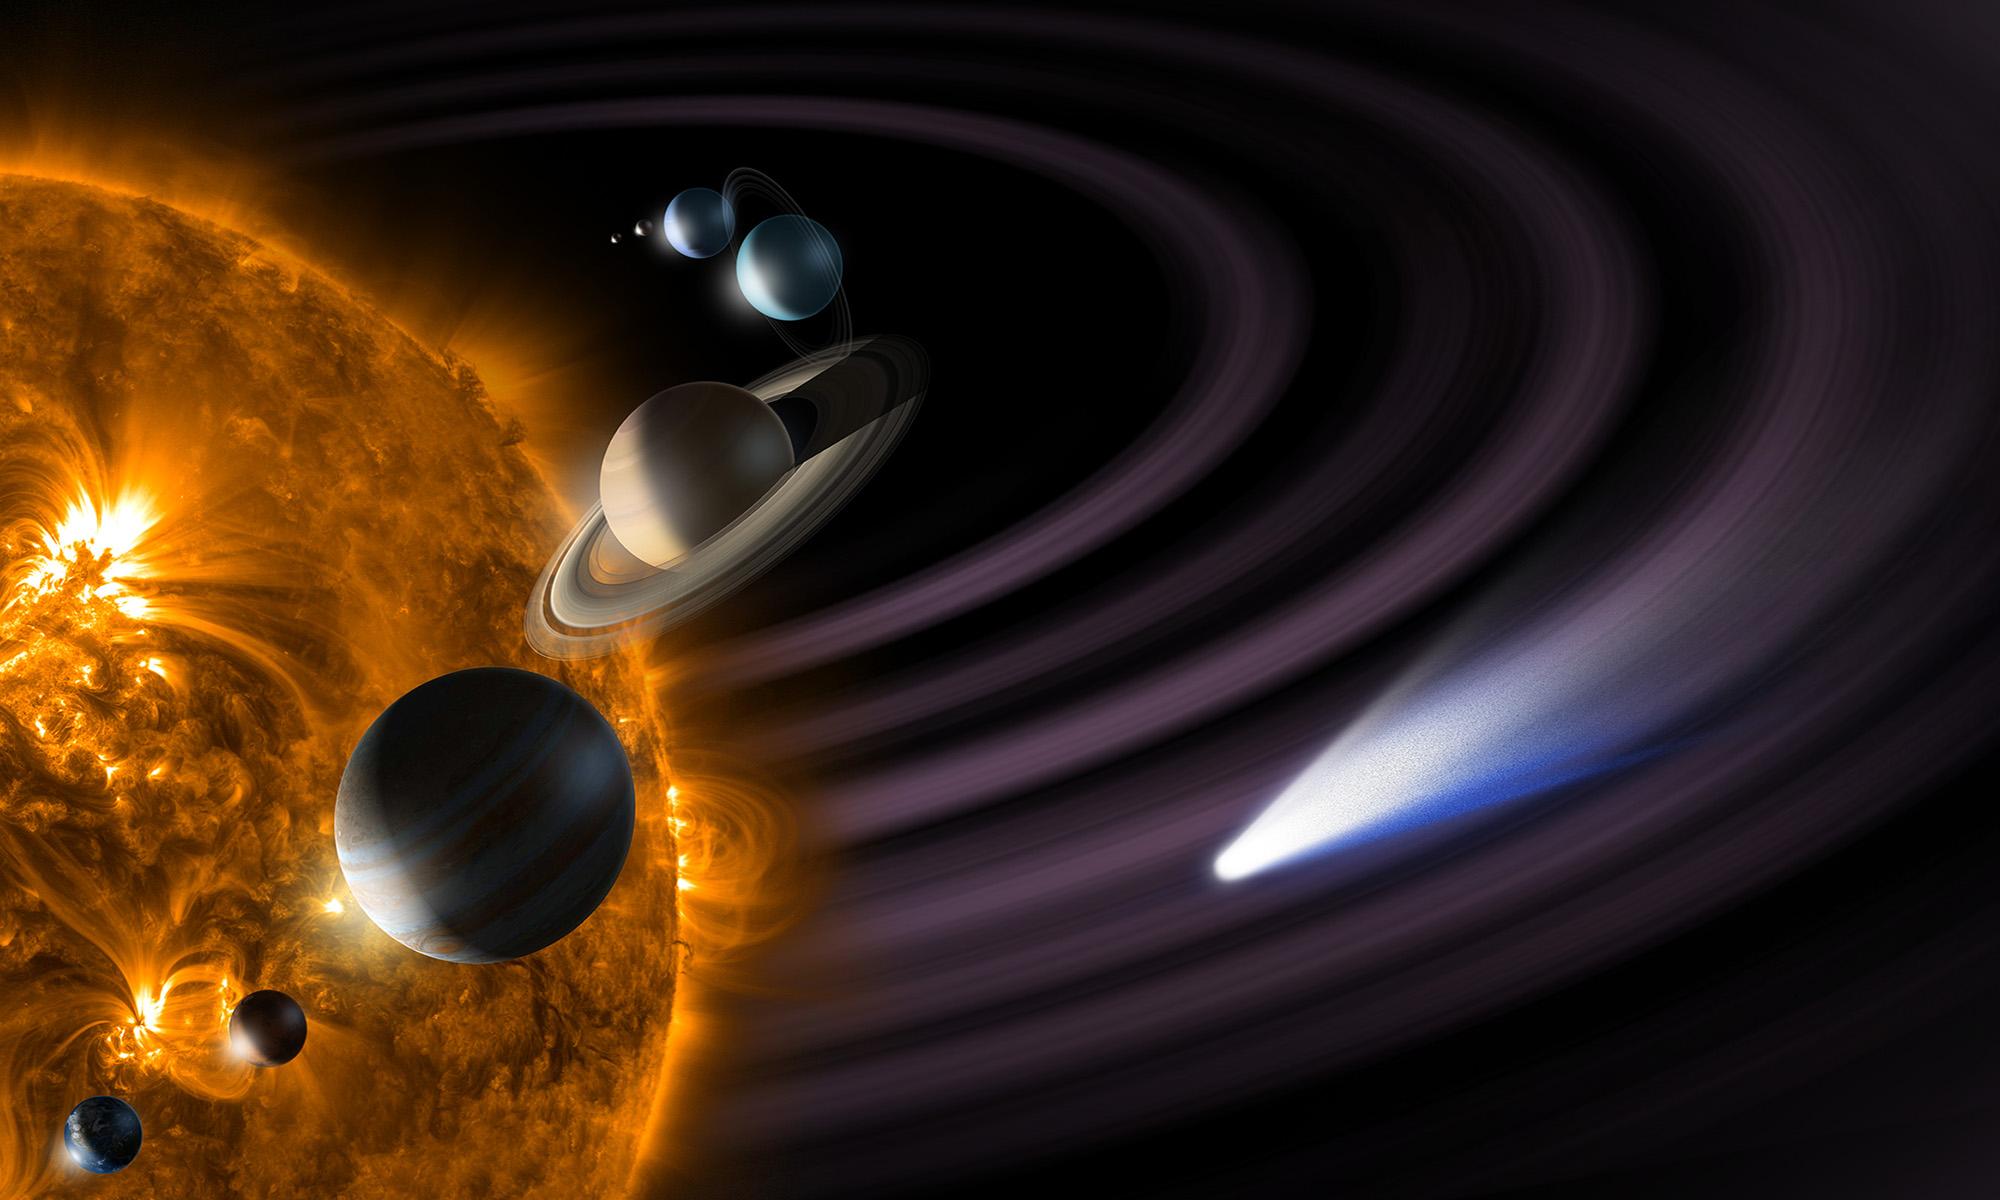 Parking Lot Solar System